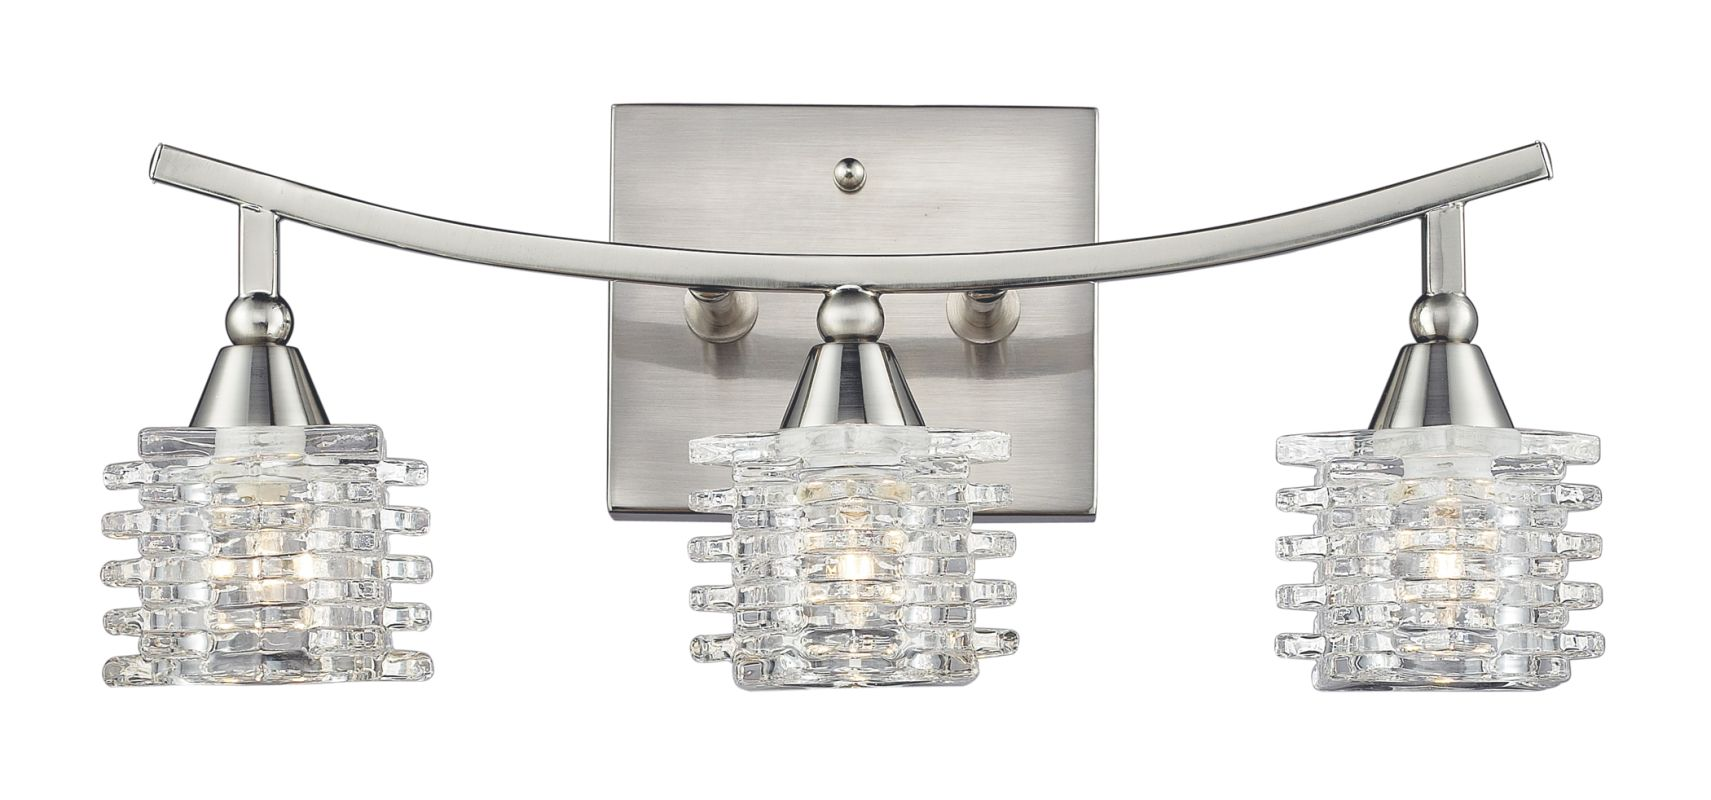 Shop Portfolio 3 Light Vassar Brushed Nickel Bathroom: Elk Lighting 17131/3 Satin Nickel Matrix 3 Light 15